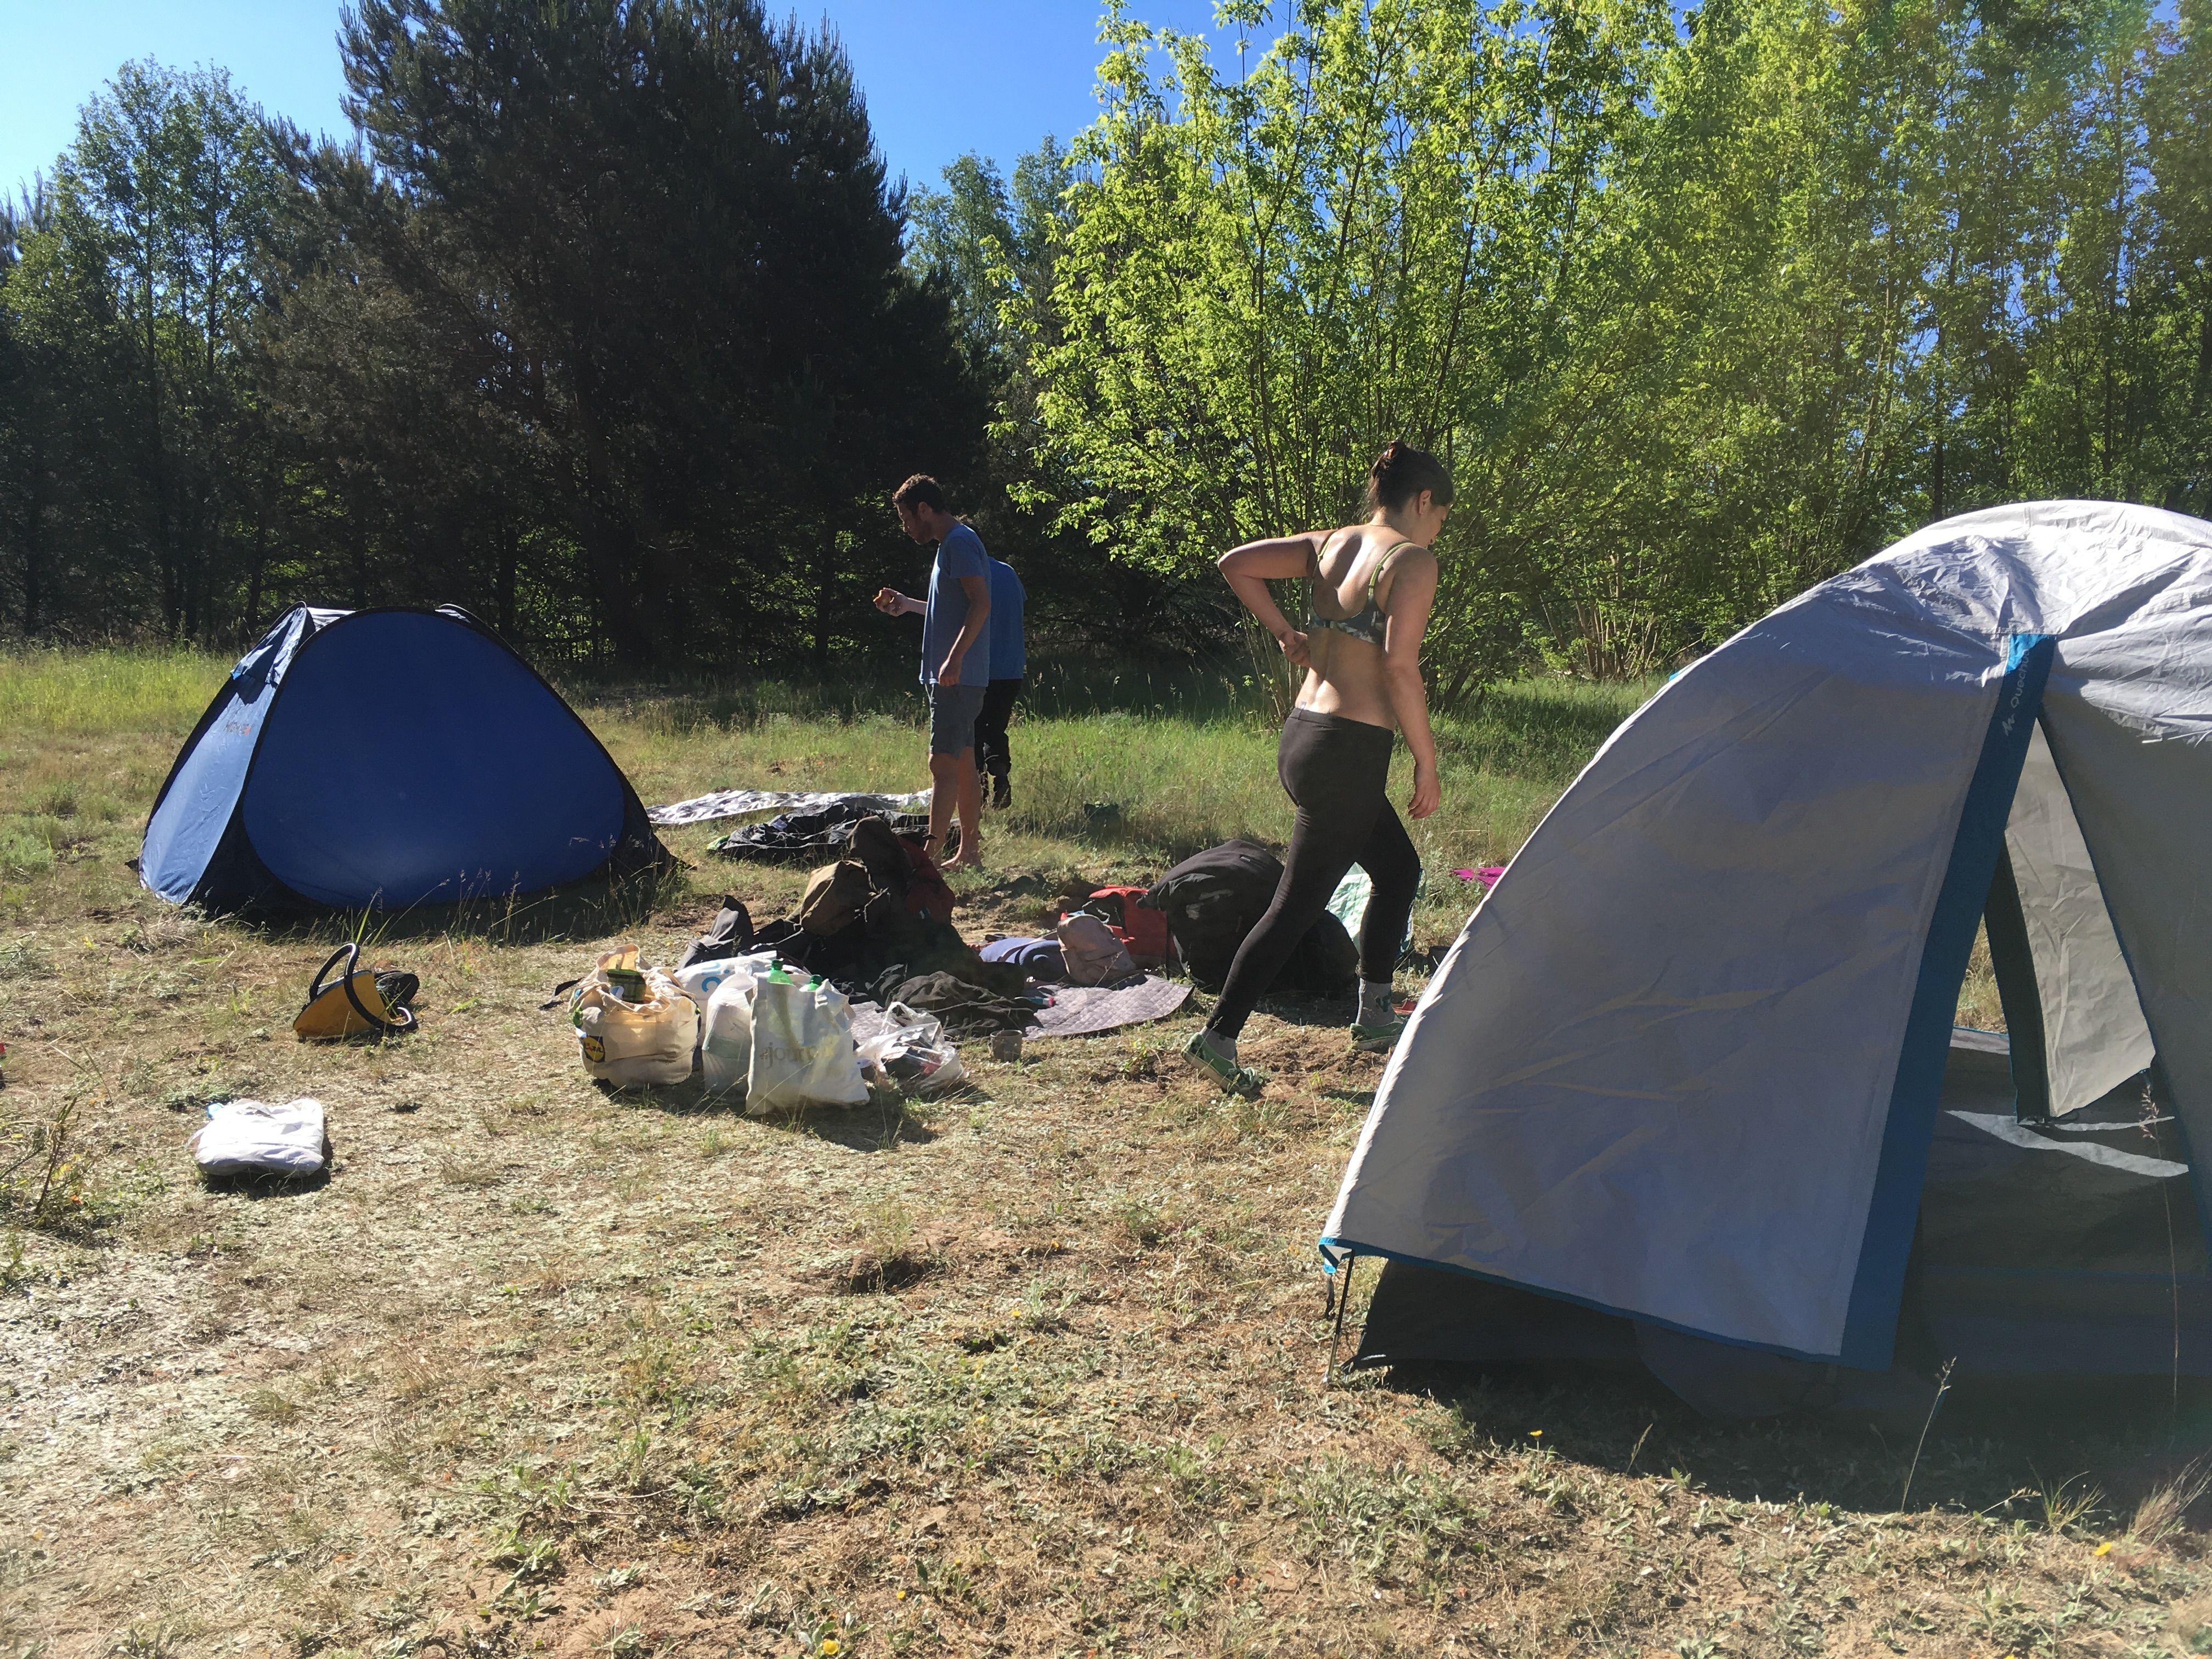 @Wild Camping @Germany   Deutschland, Wild campen, Camping